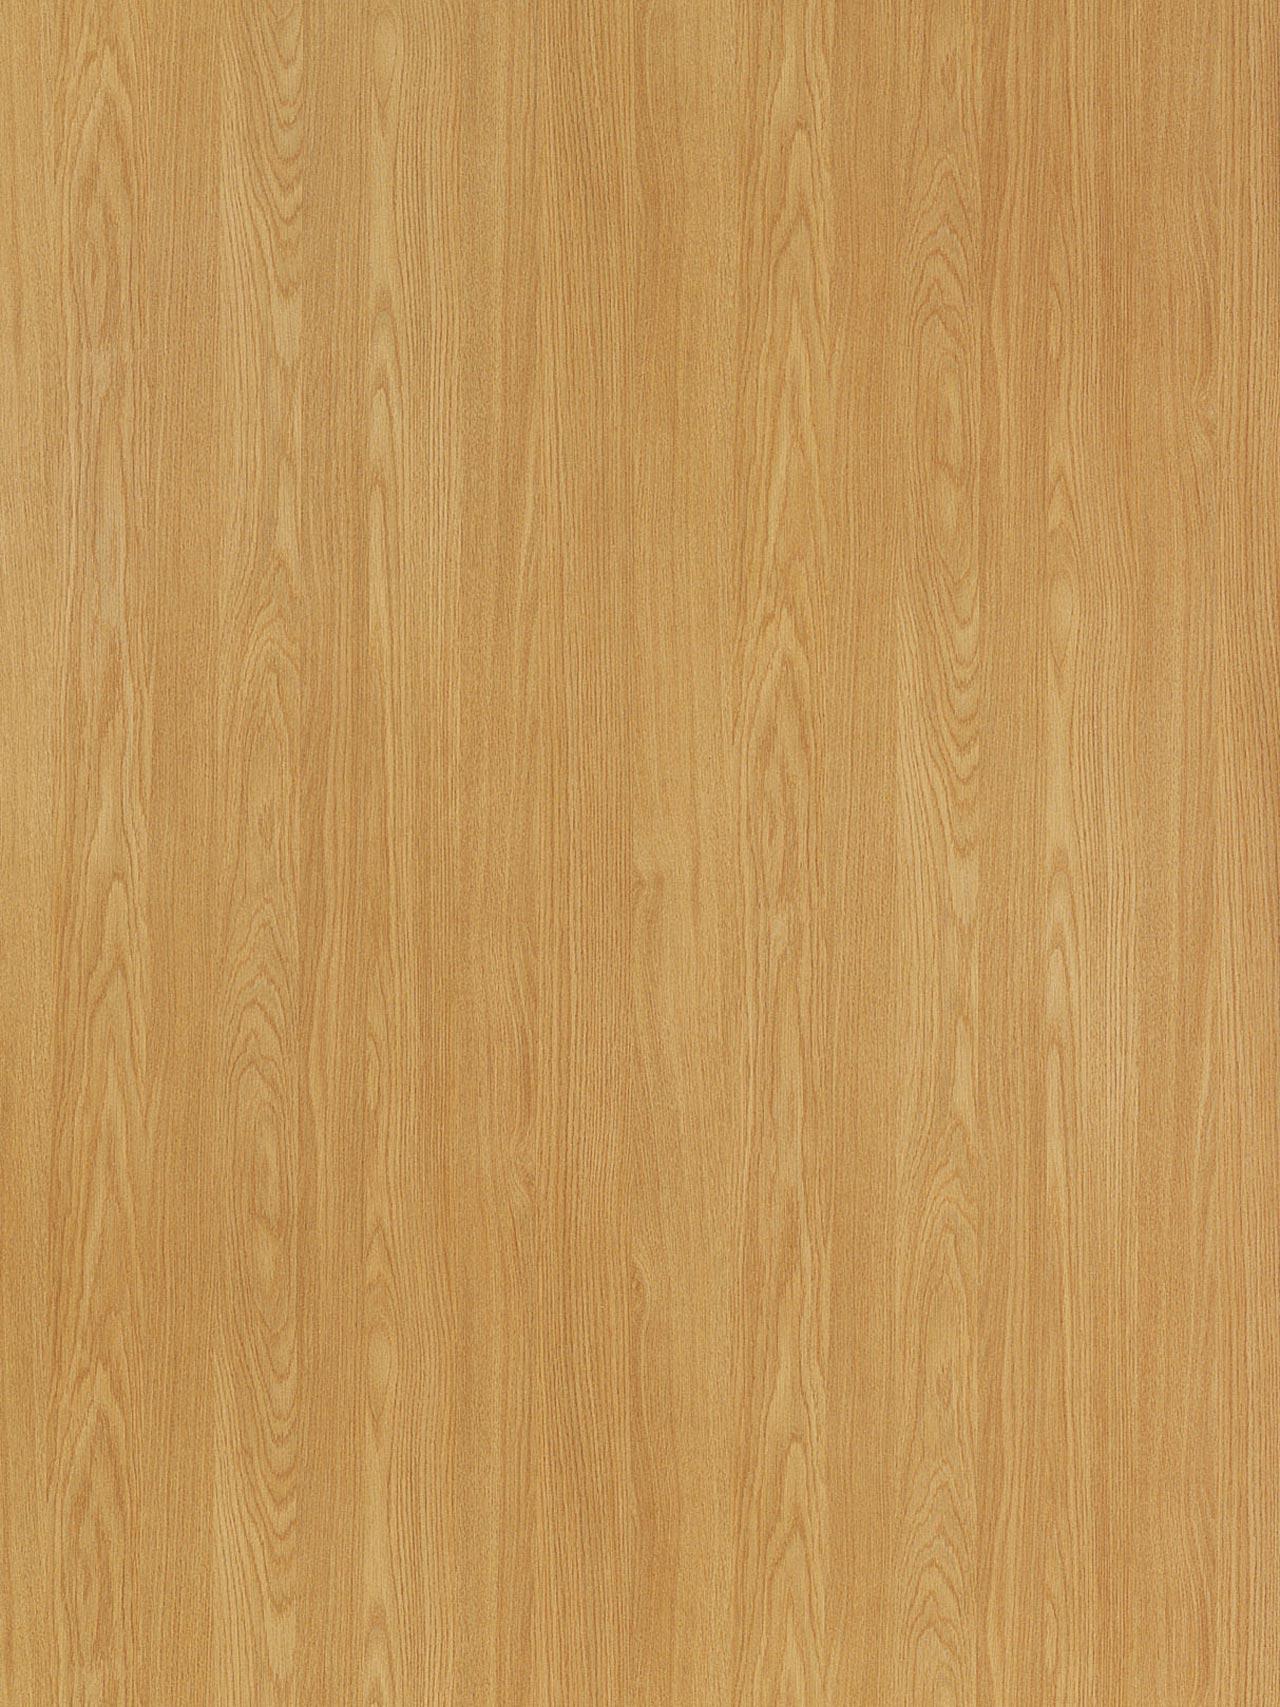 Melamina madera Roble Espuña Losán